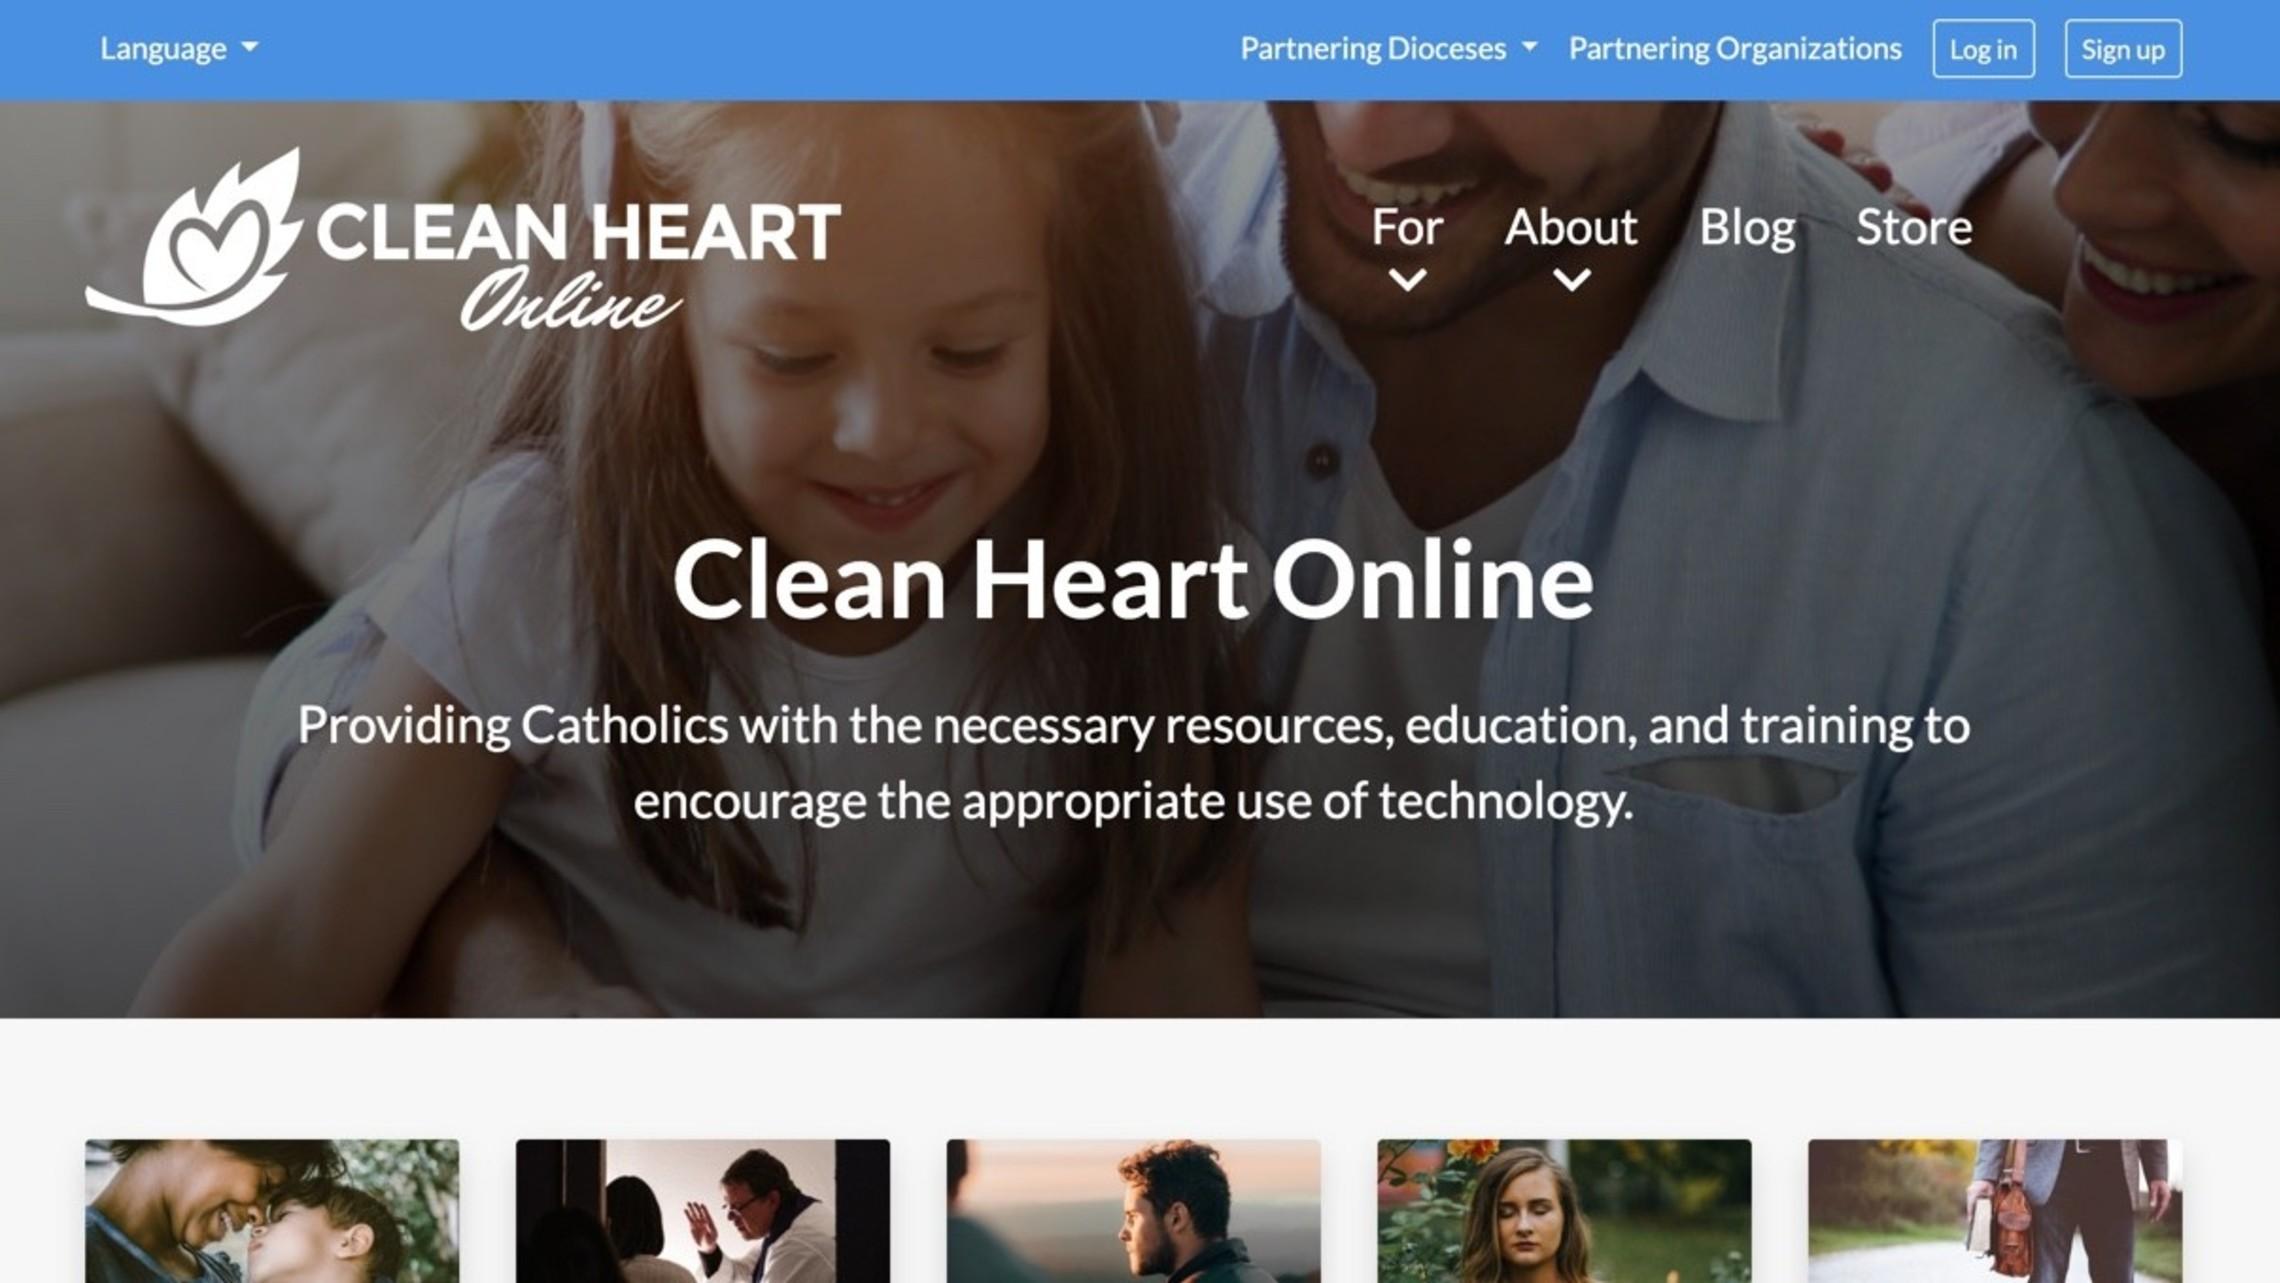 Clean Heart Online